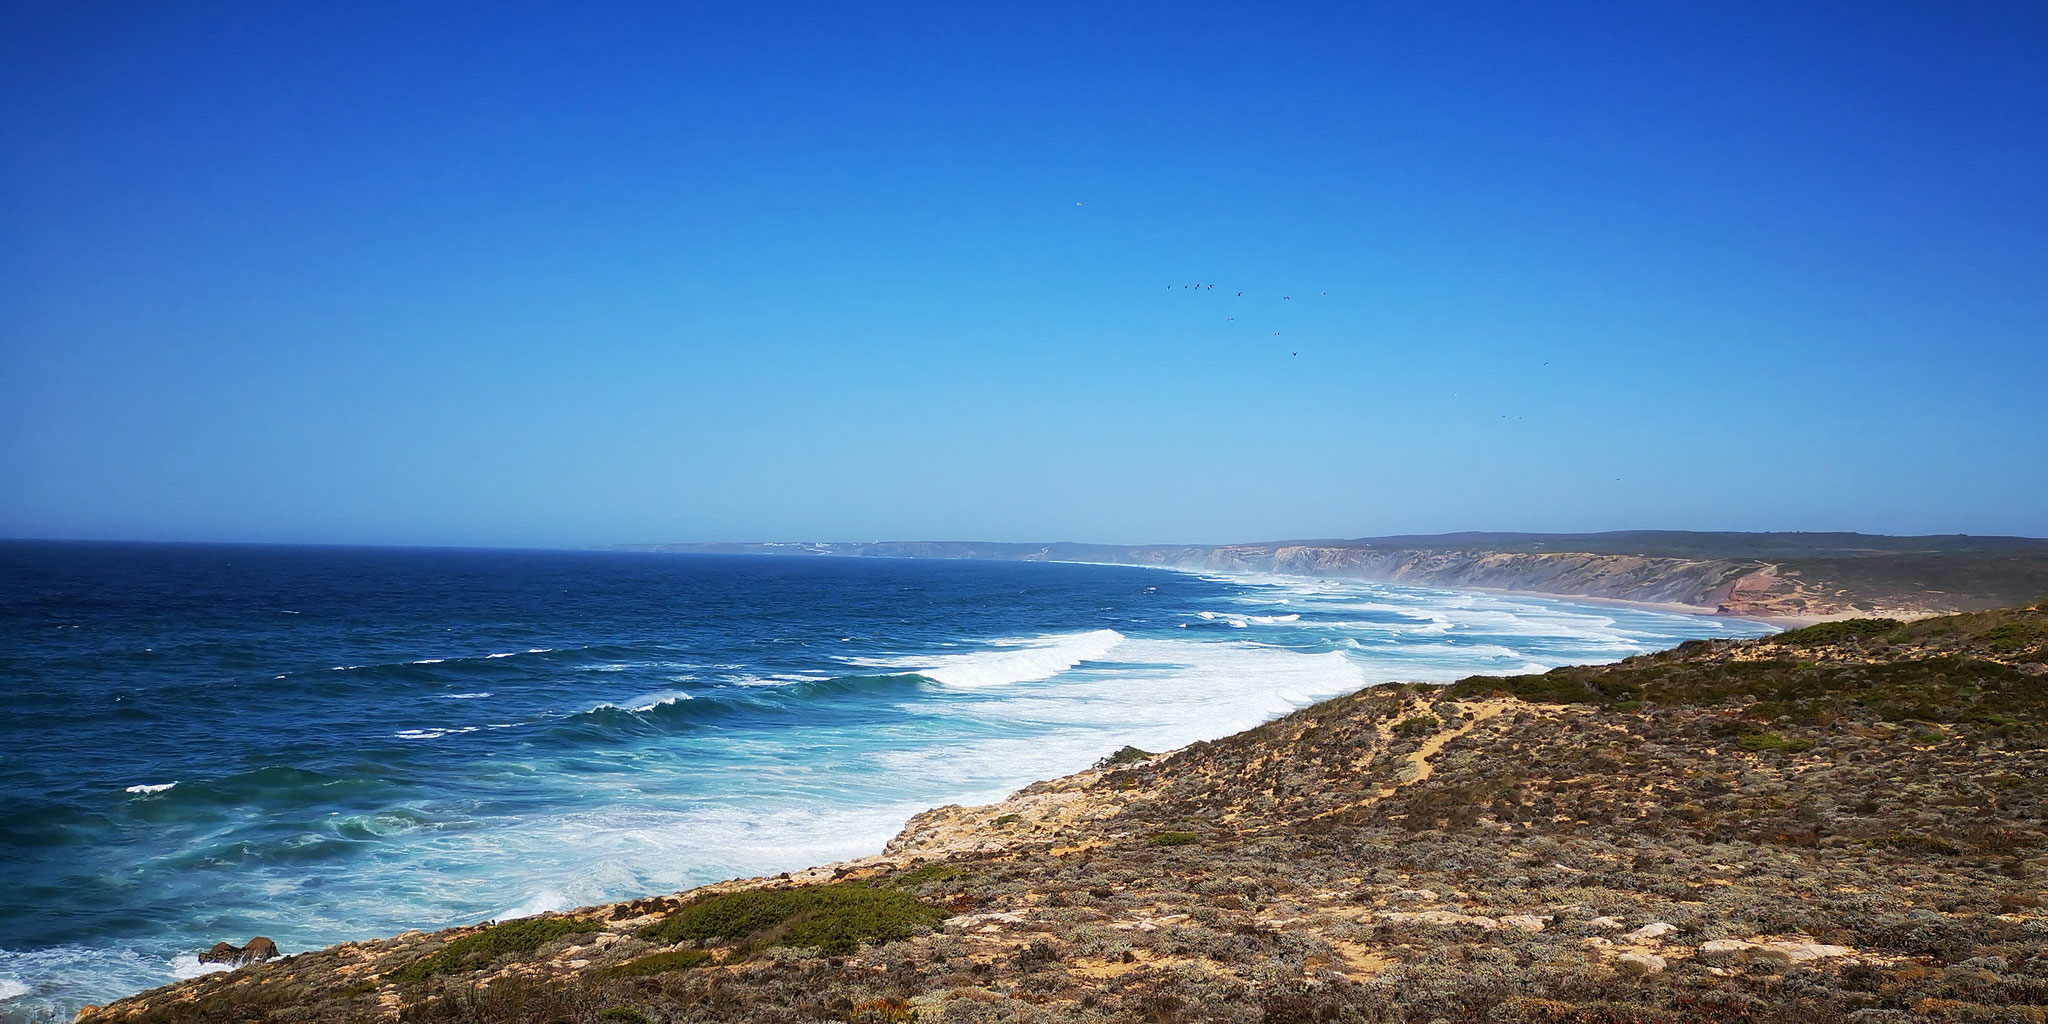 Portugal - Praia do Bordeira